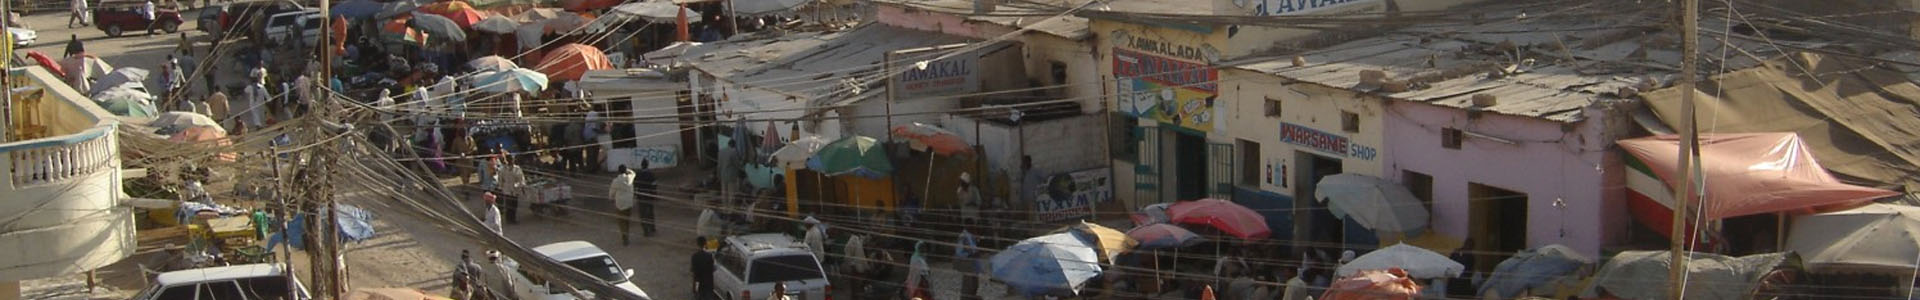 Scene of African market